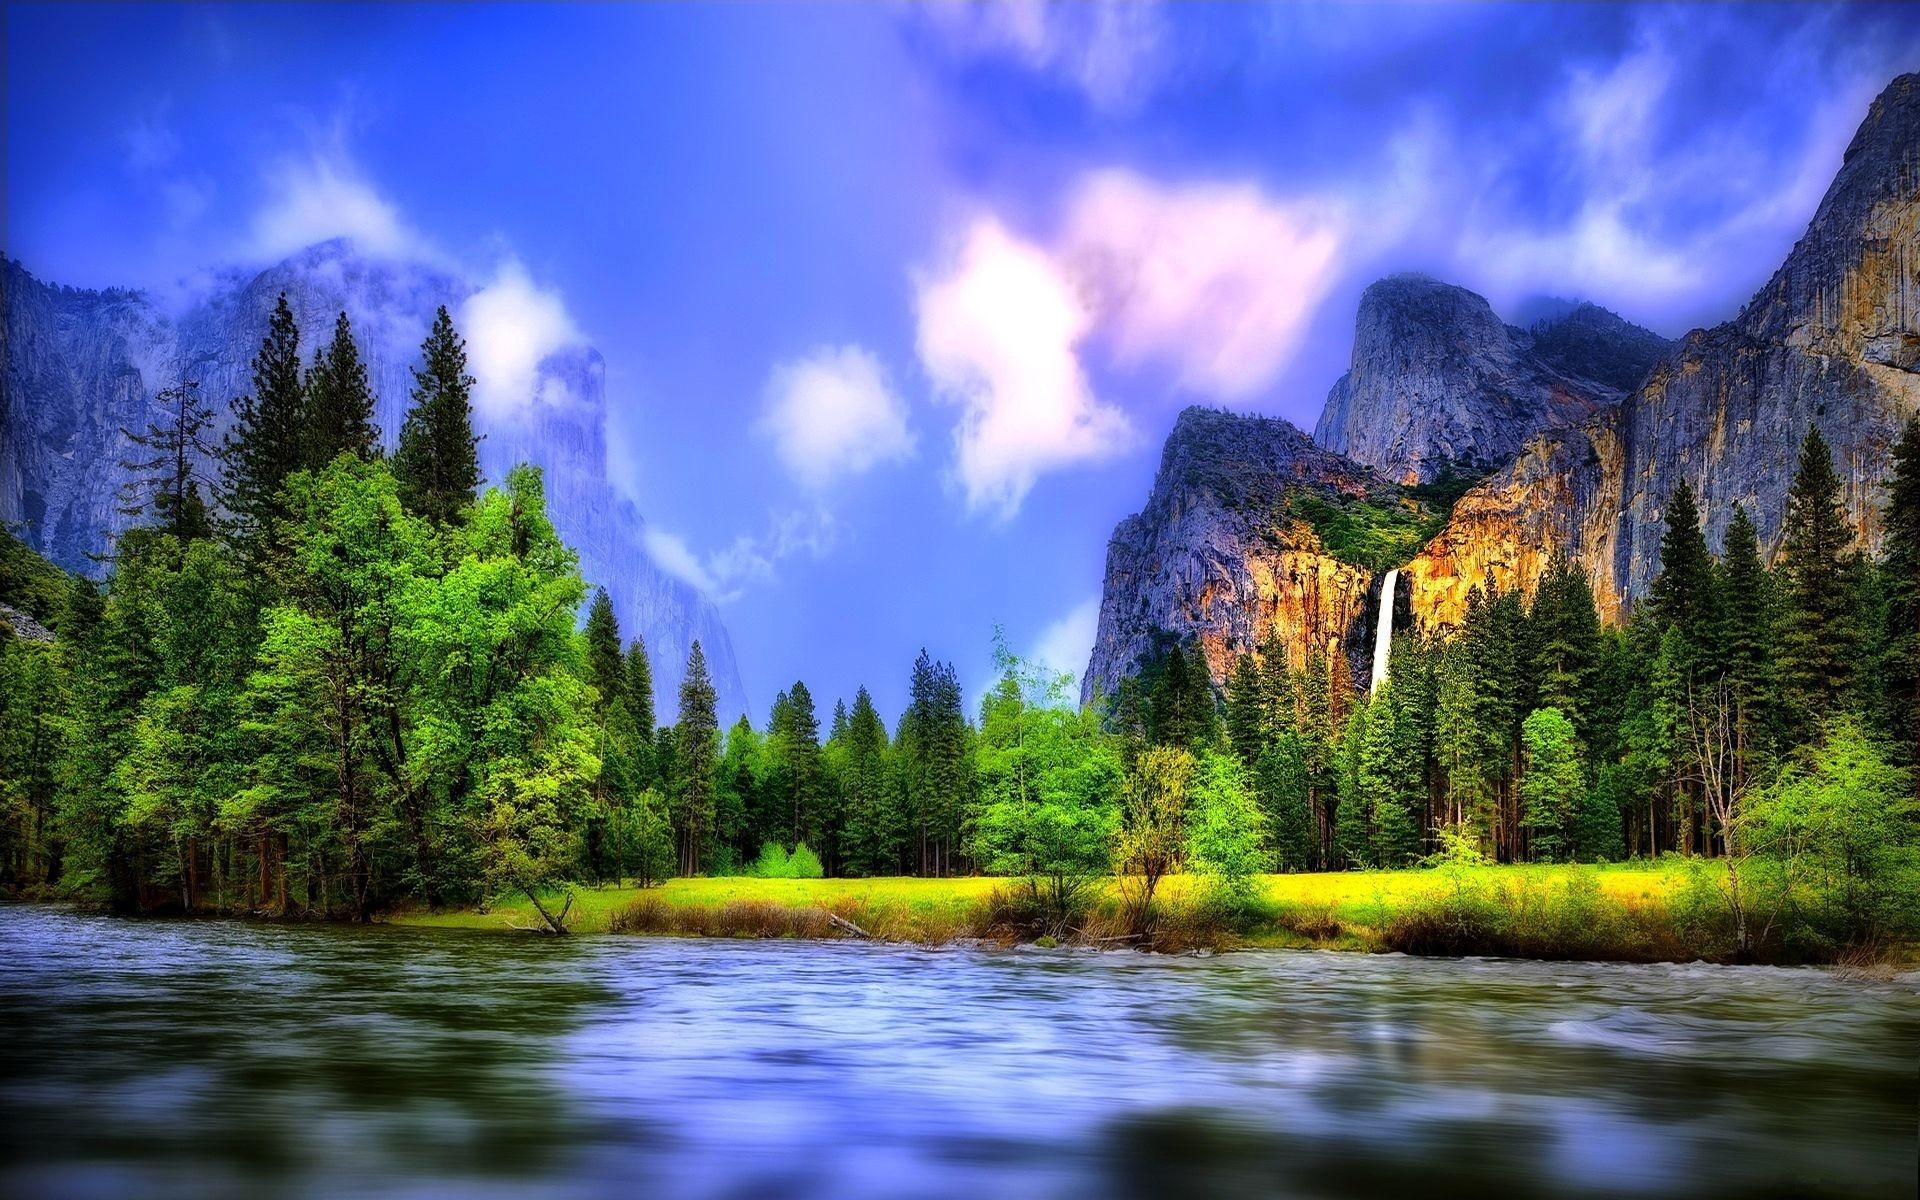 Wallpaper Beautiful Landscape River Forest Waterfalls